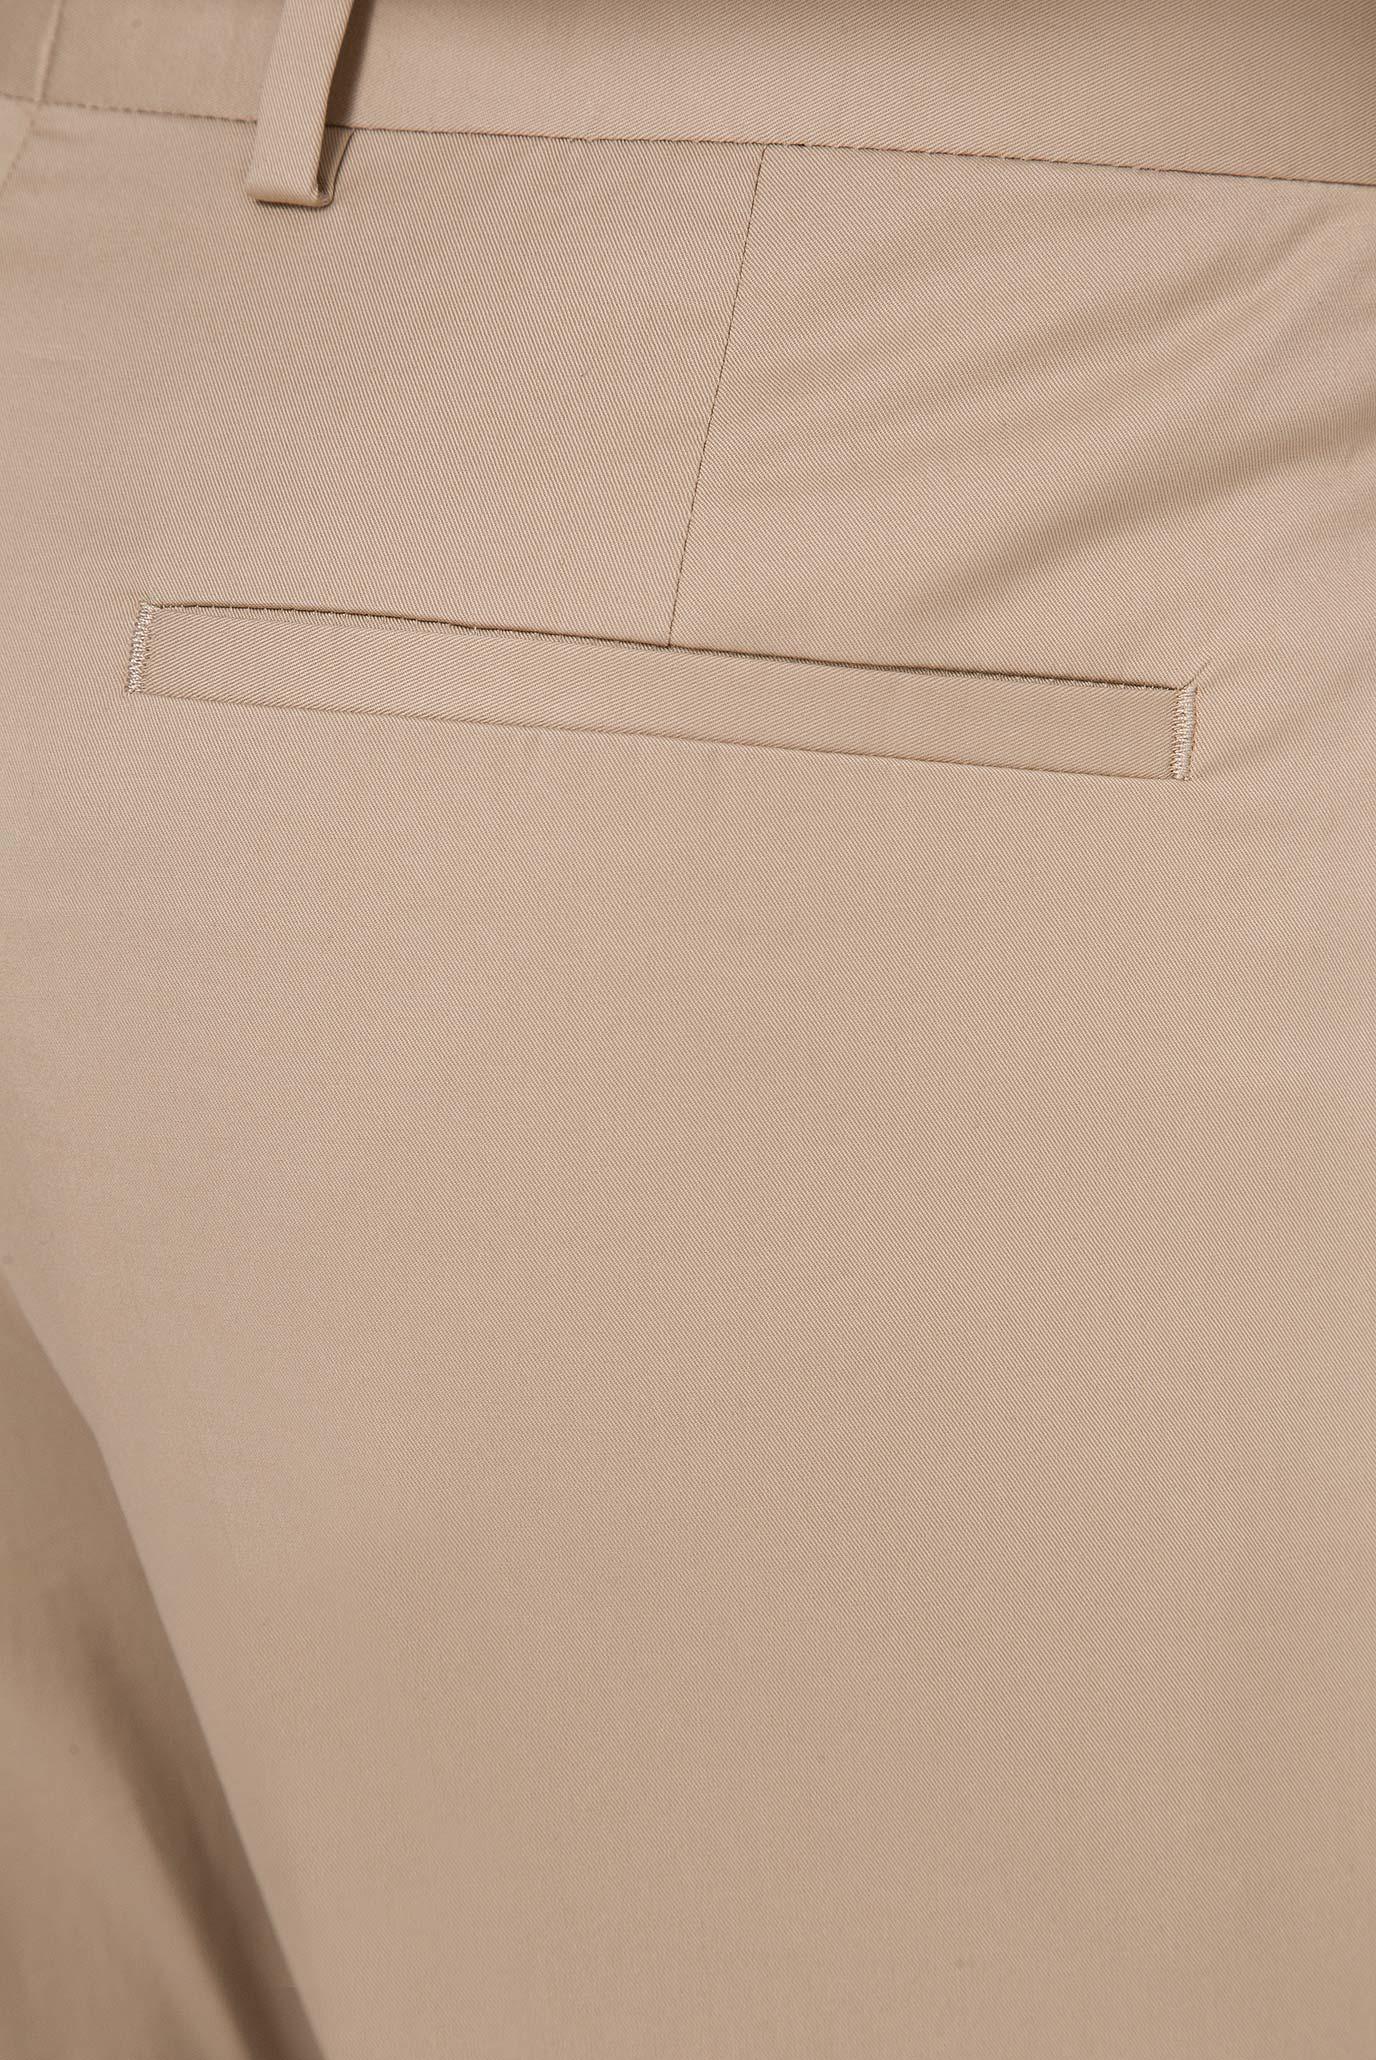 Купить Мужские бежевые чиносы FINE SUMMER COTTON TWILL PANT Calvin Klein Calvin Klein K10K103450 – Киев, Украина. Цены в интернет магазине MD Fashion